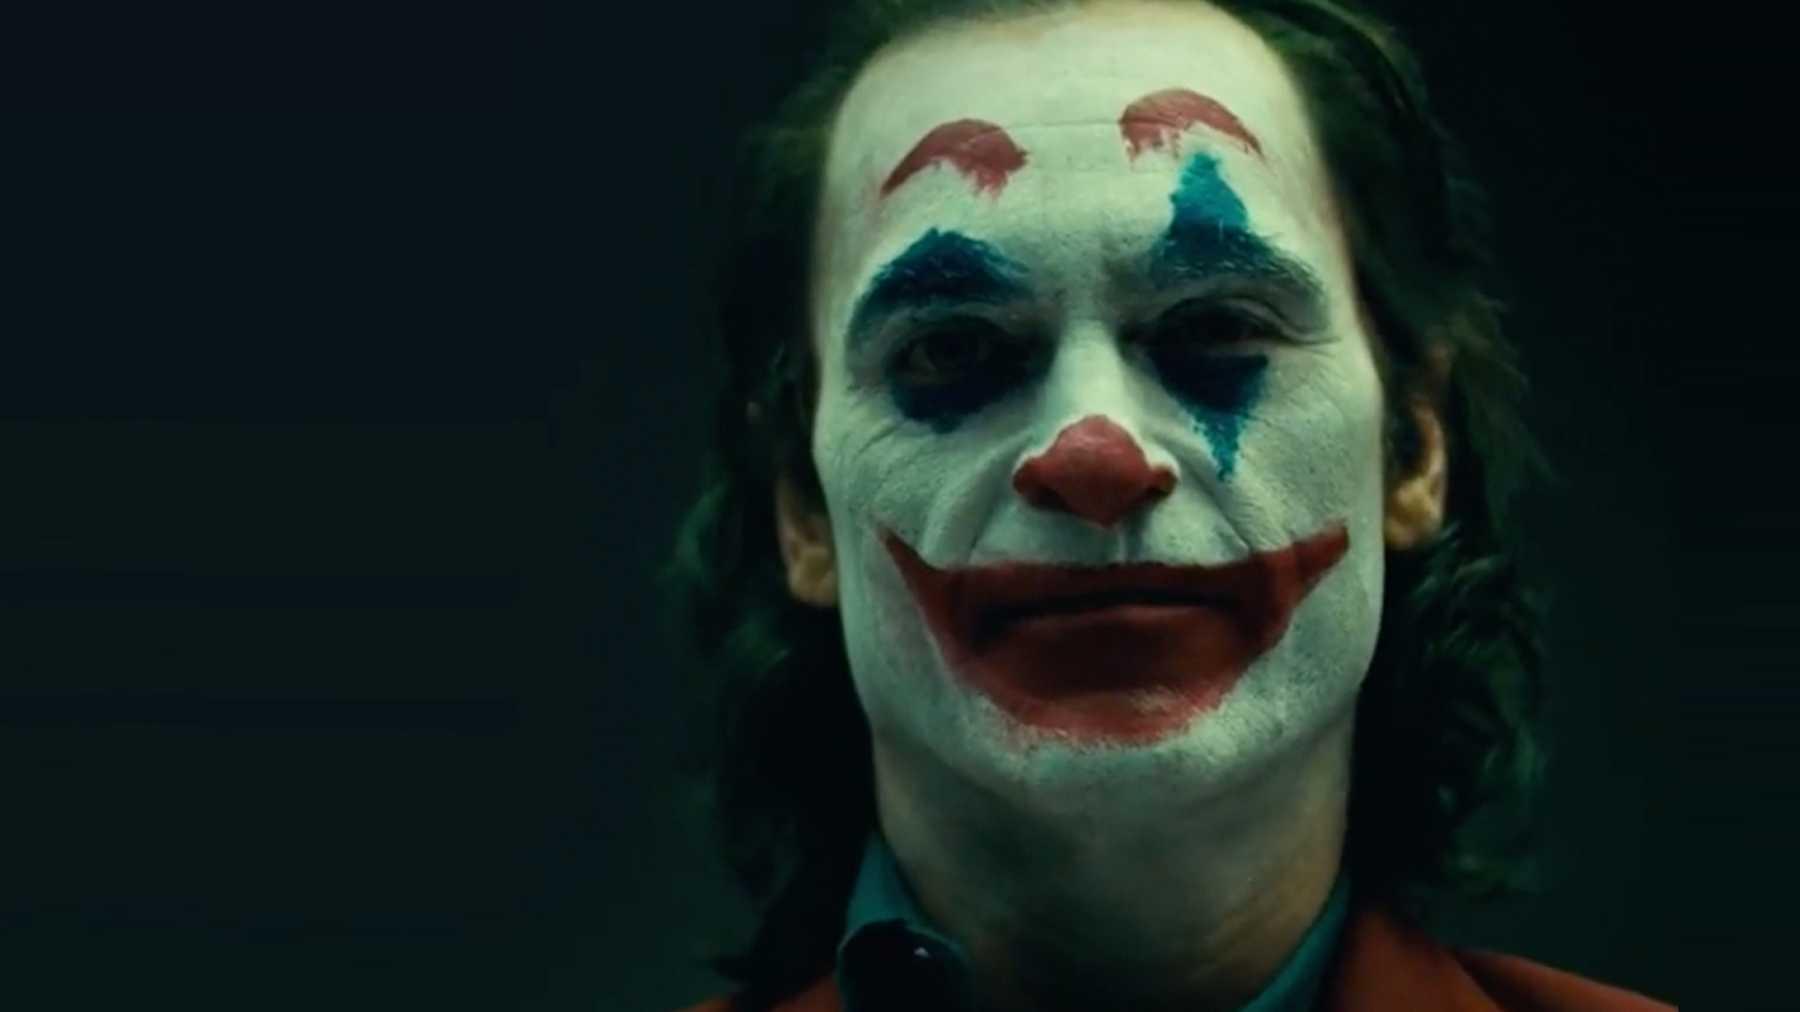 Joker Review - Joaquin Phoenix as the titular character